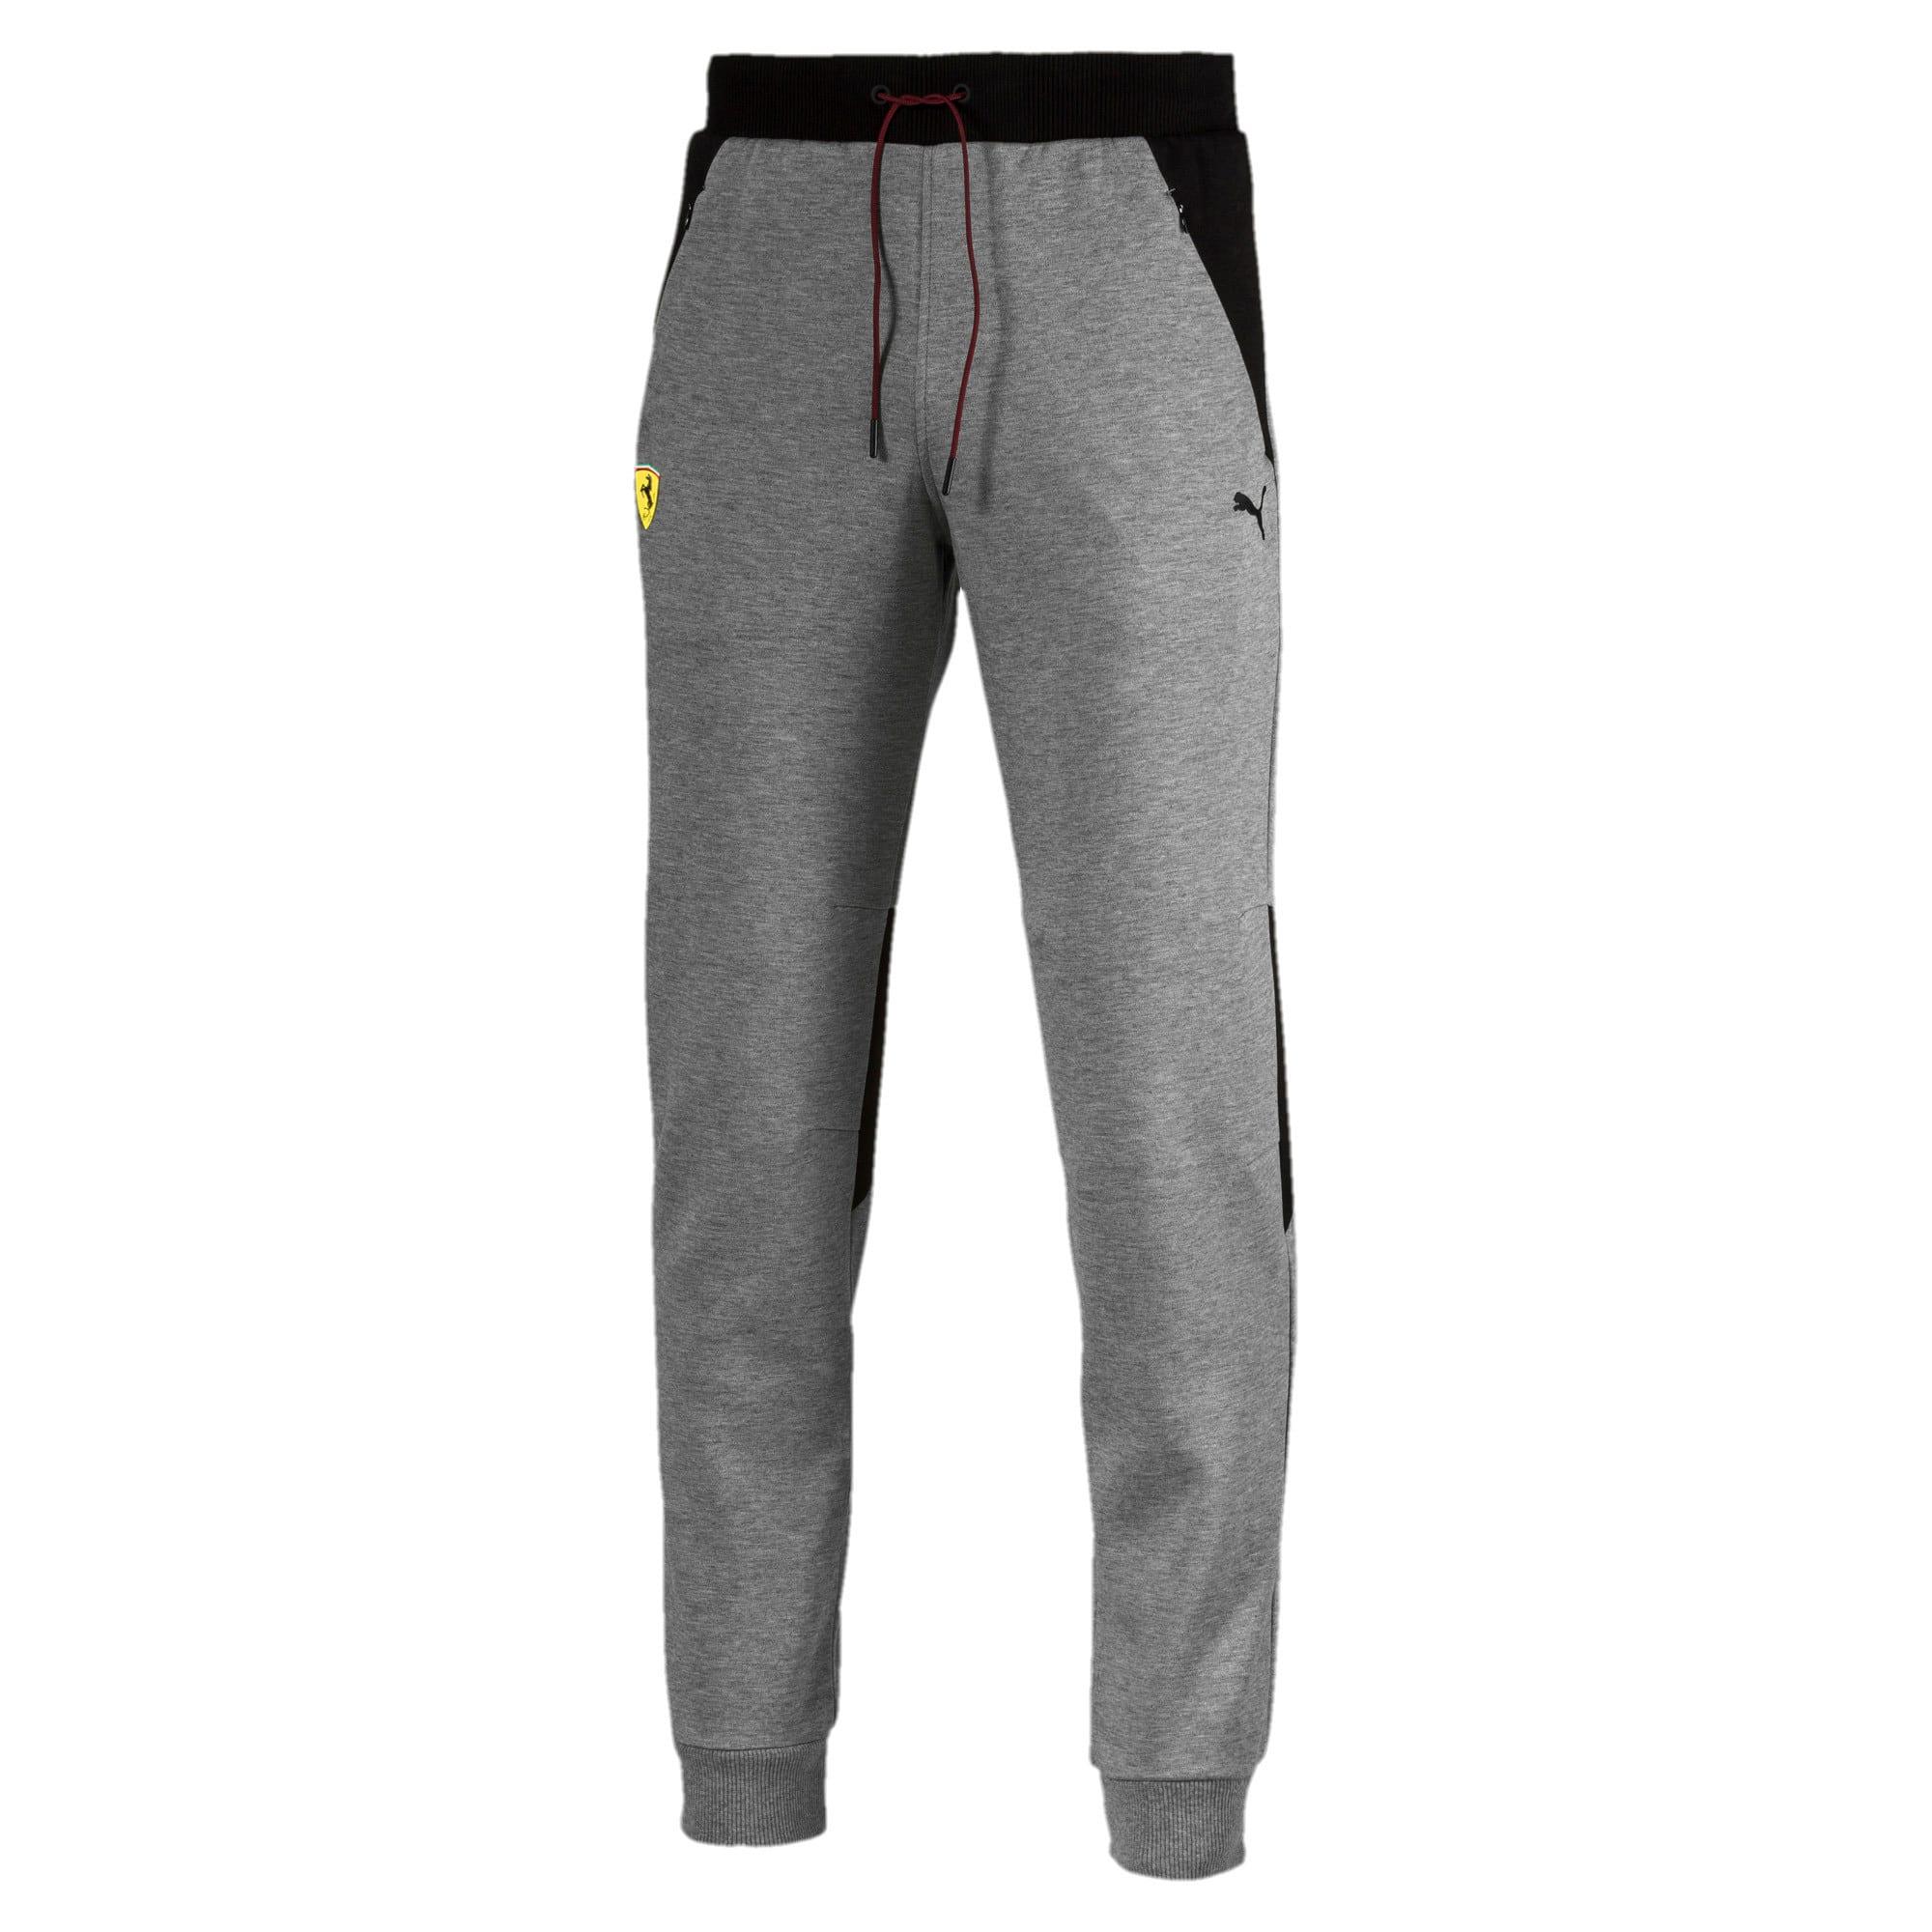 Thumbnail 1 of Ferrari Men's Sweatpants, Medium Gray Heather, medium-IND